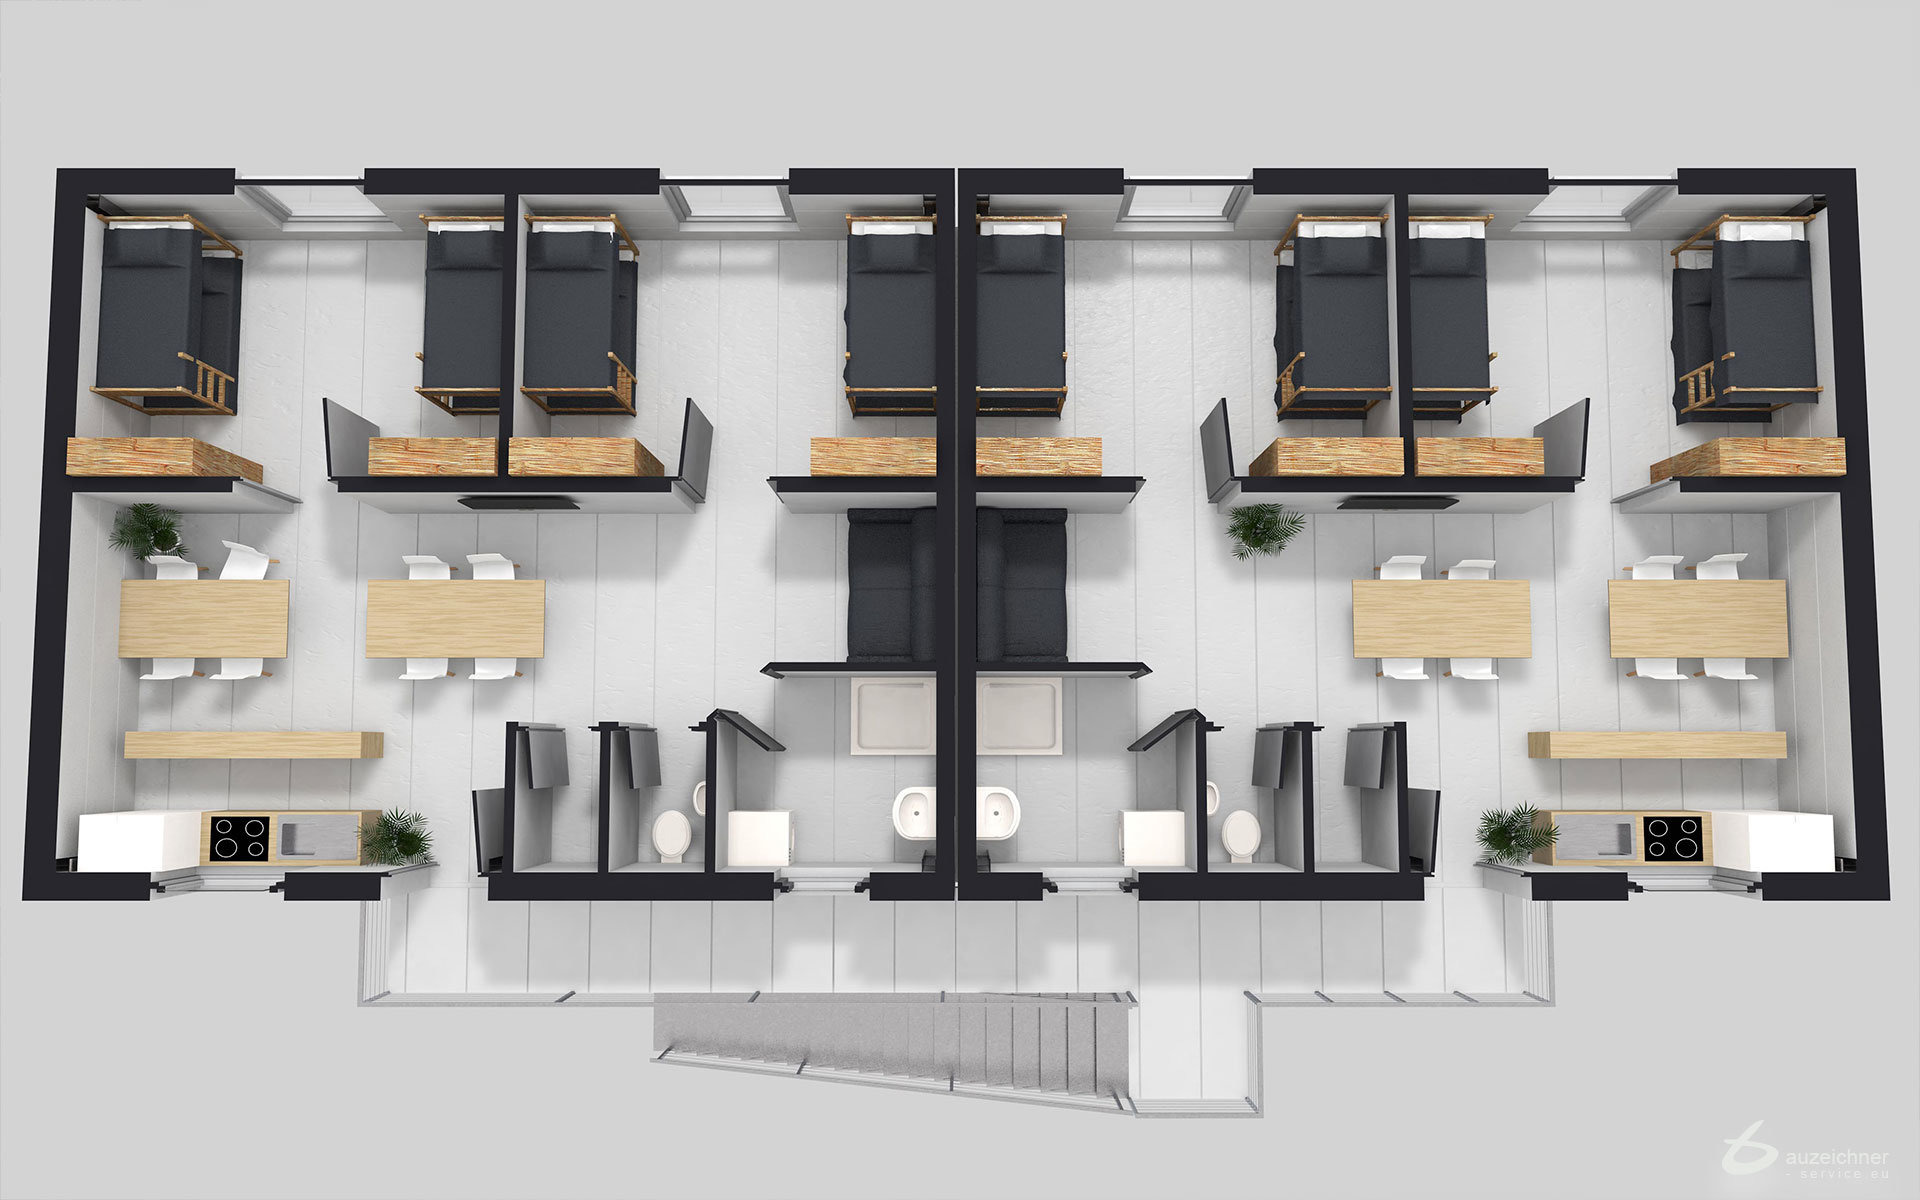 Grundriss in 3D, Flüchtlingsheim